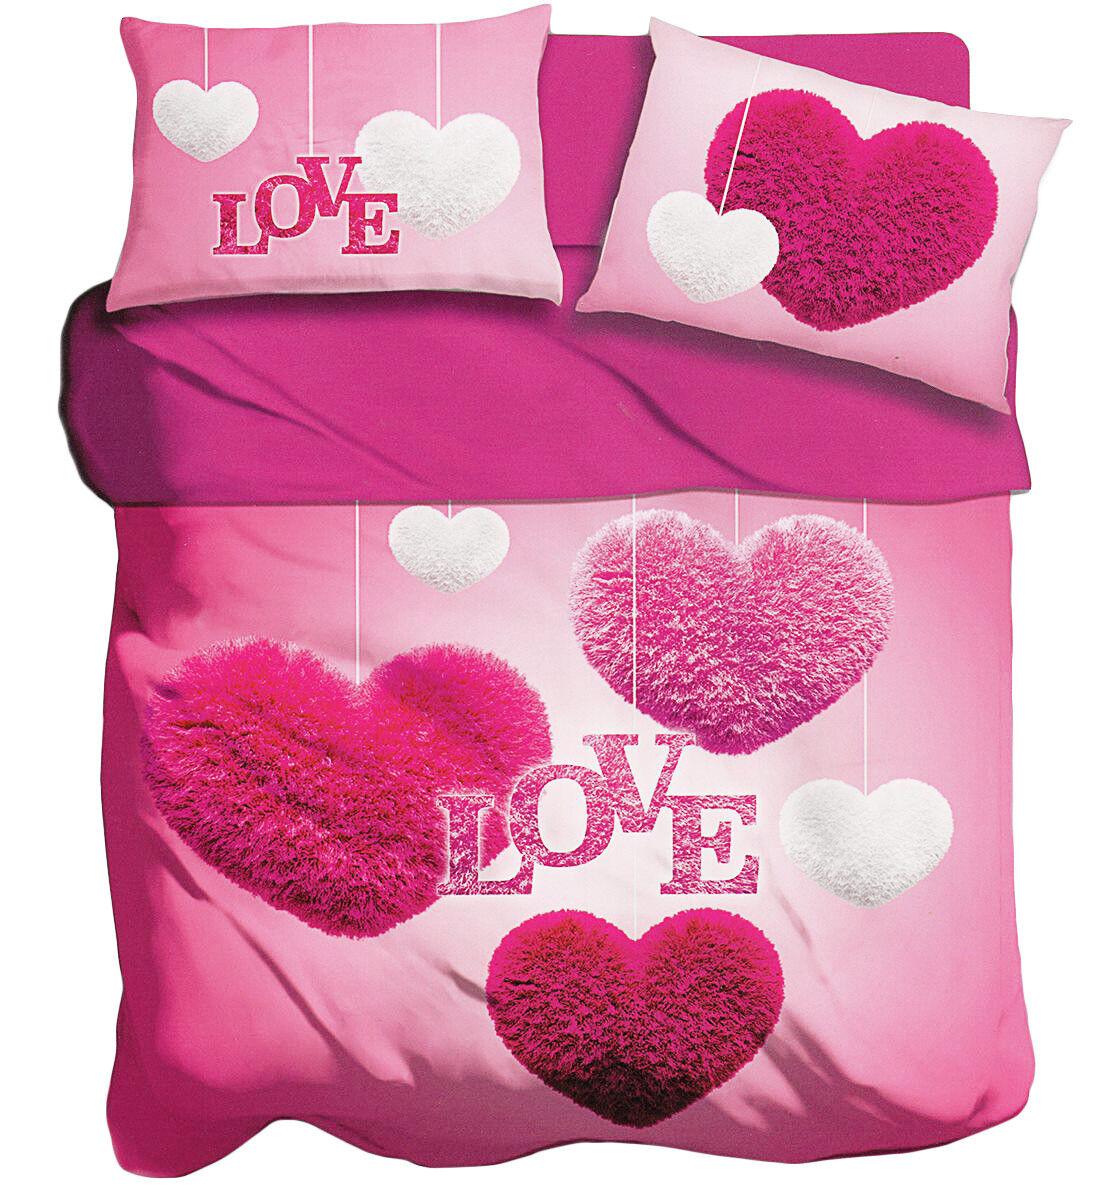 Lenzuola copriletto matrimoniale 2 piazze stampa digitale I love love love sleeping Cuori 9aae01